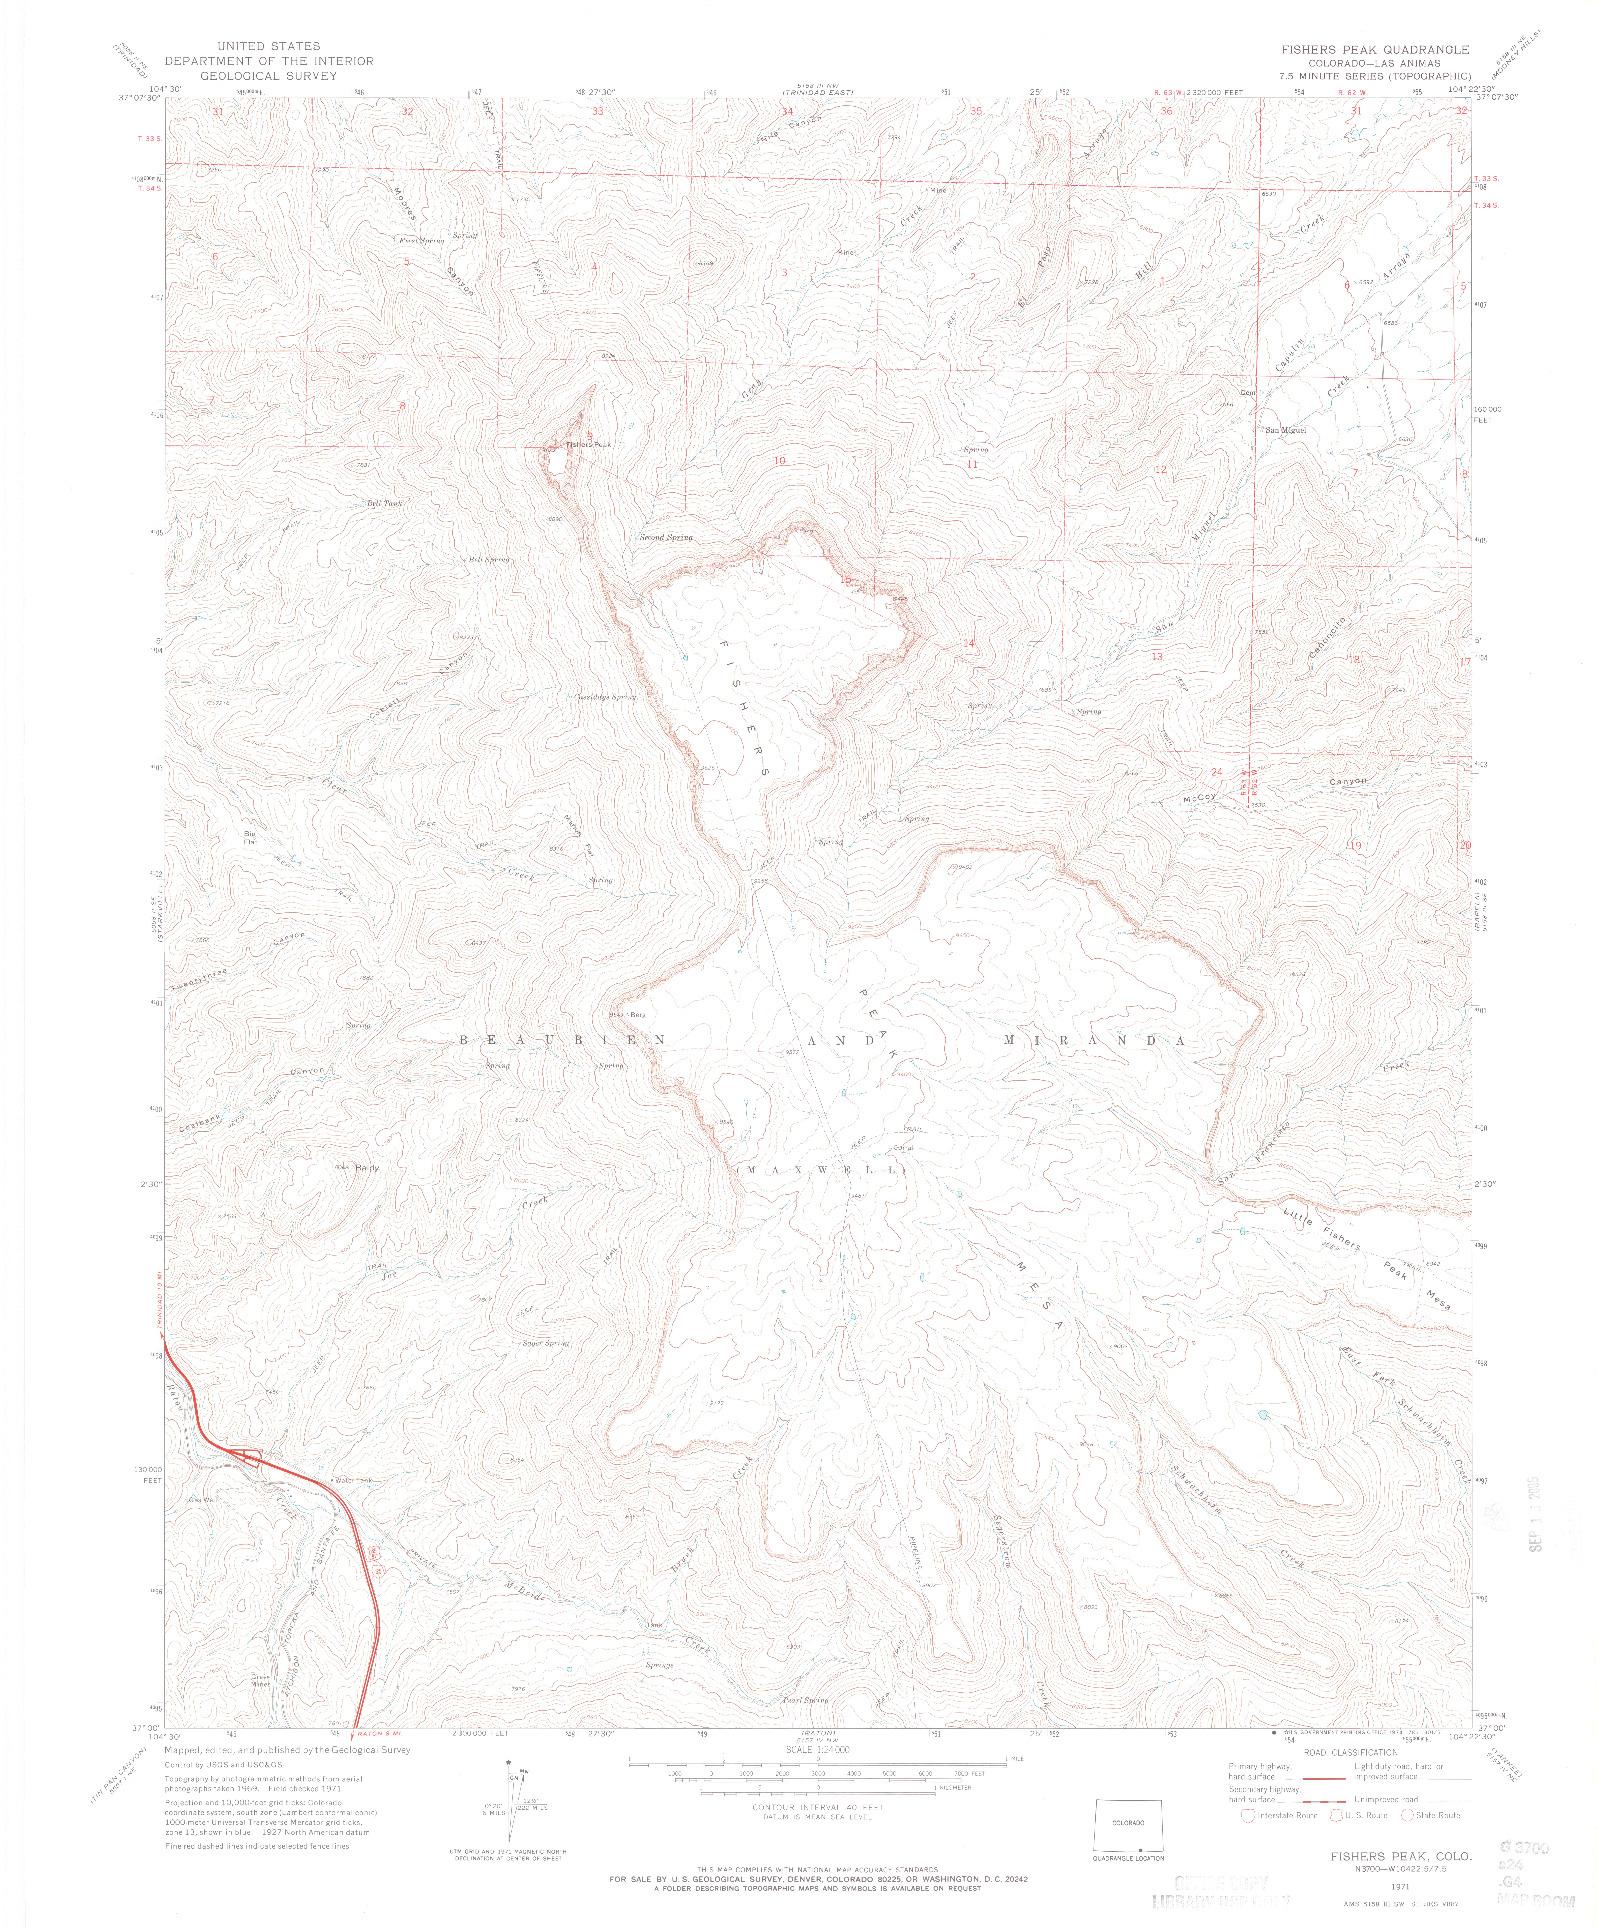 USGS 1:24000-SCALE QUADRANGLE FOR FISHERS PEAK, CO 1971